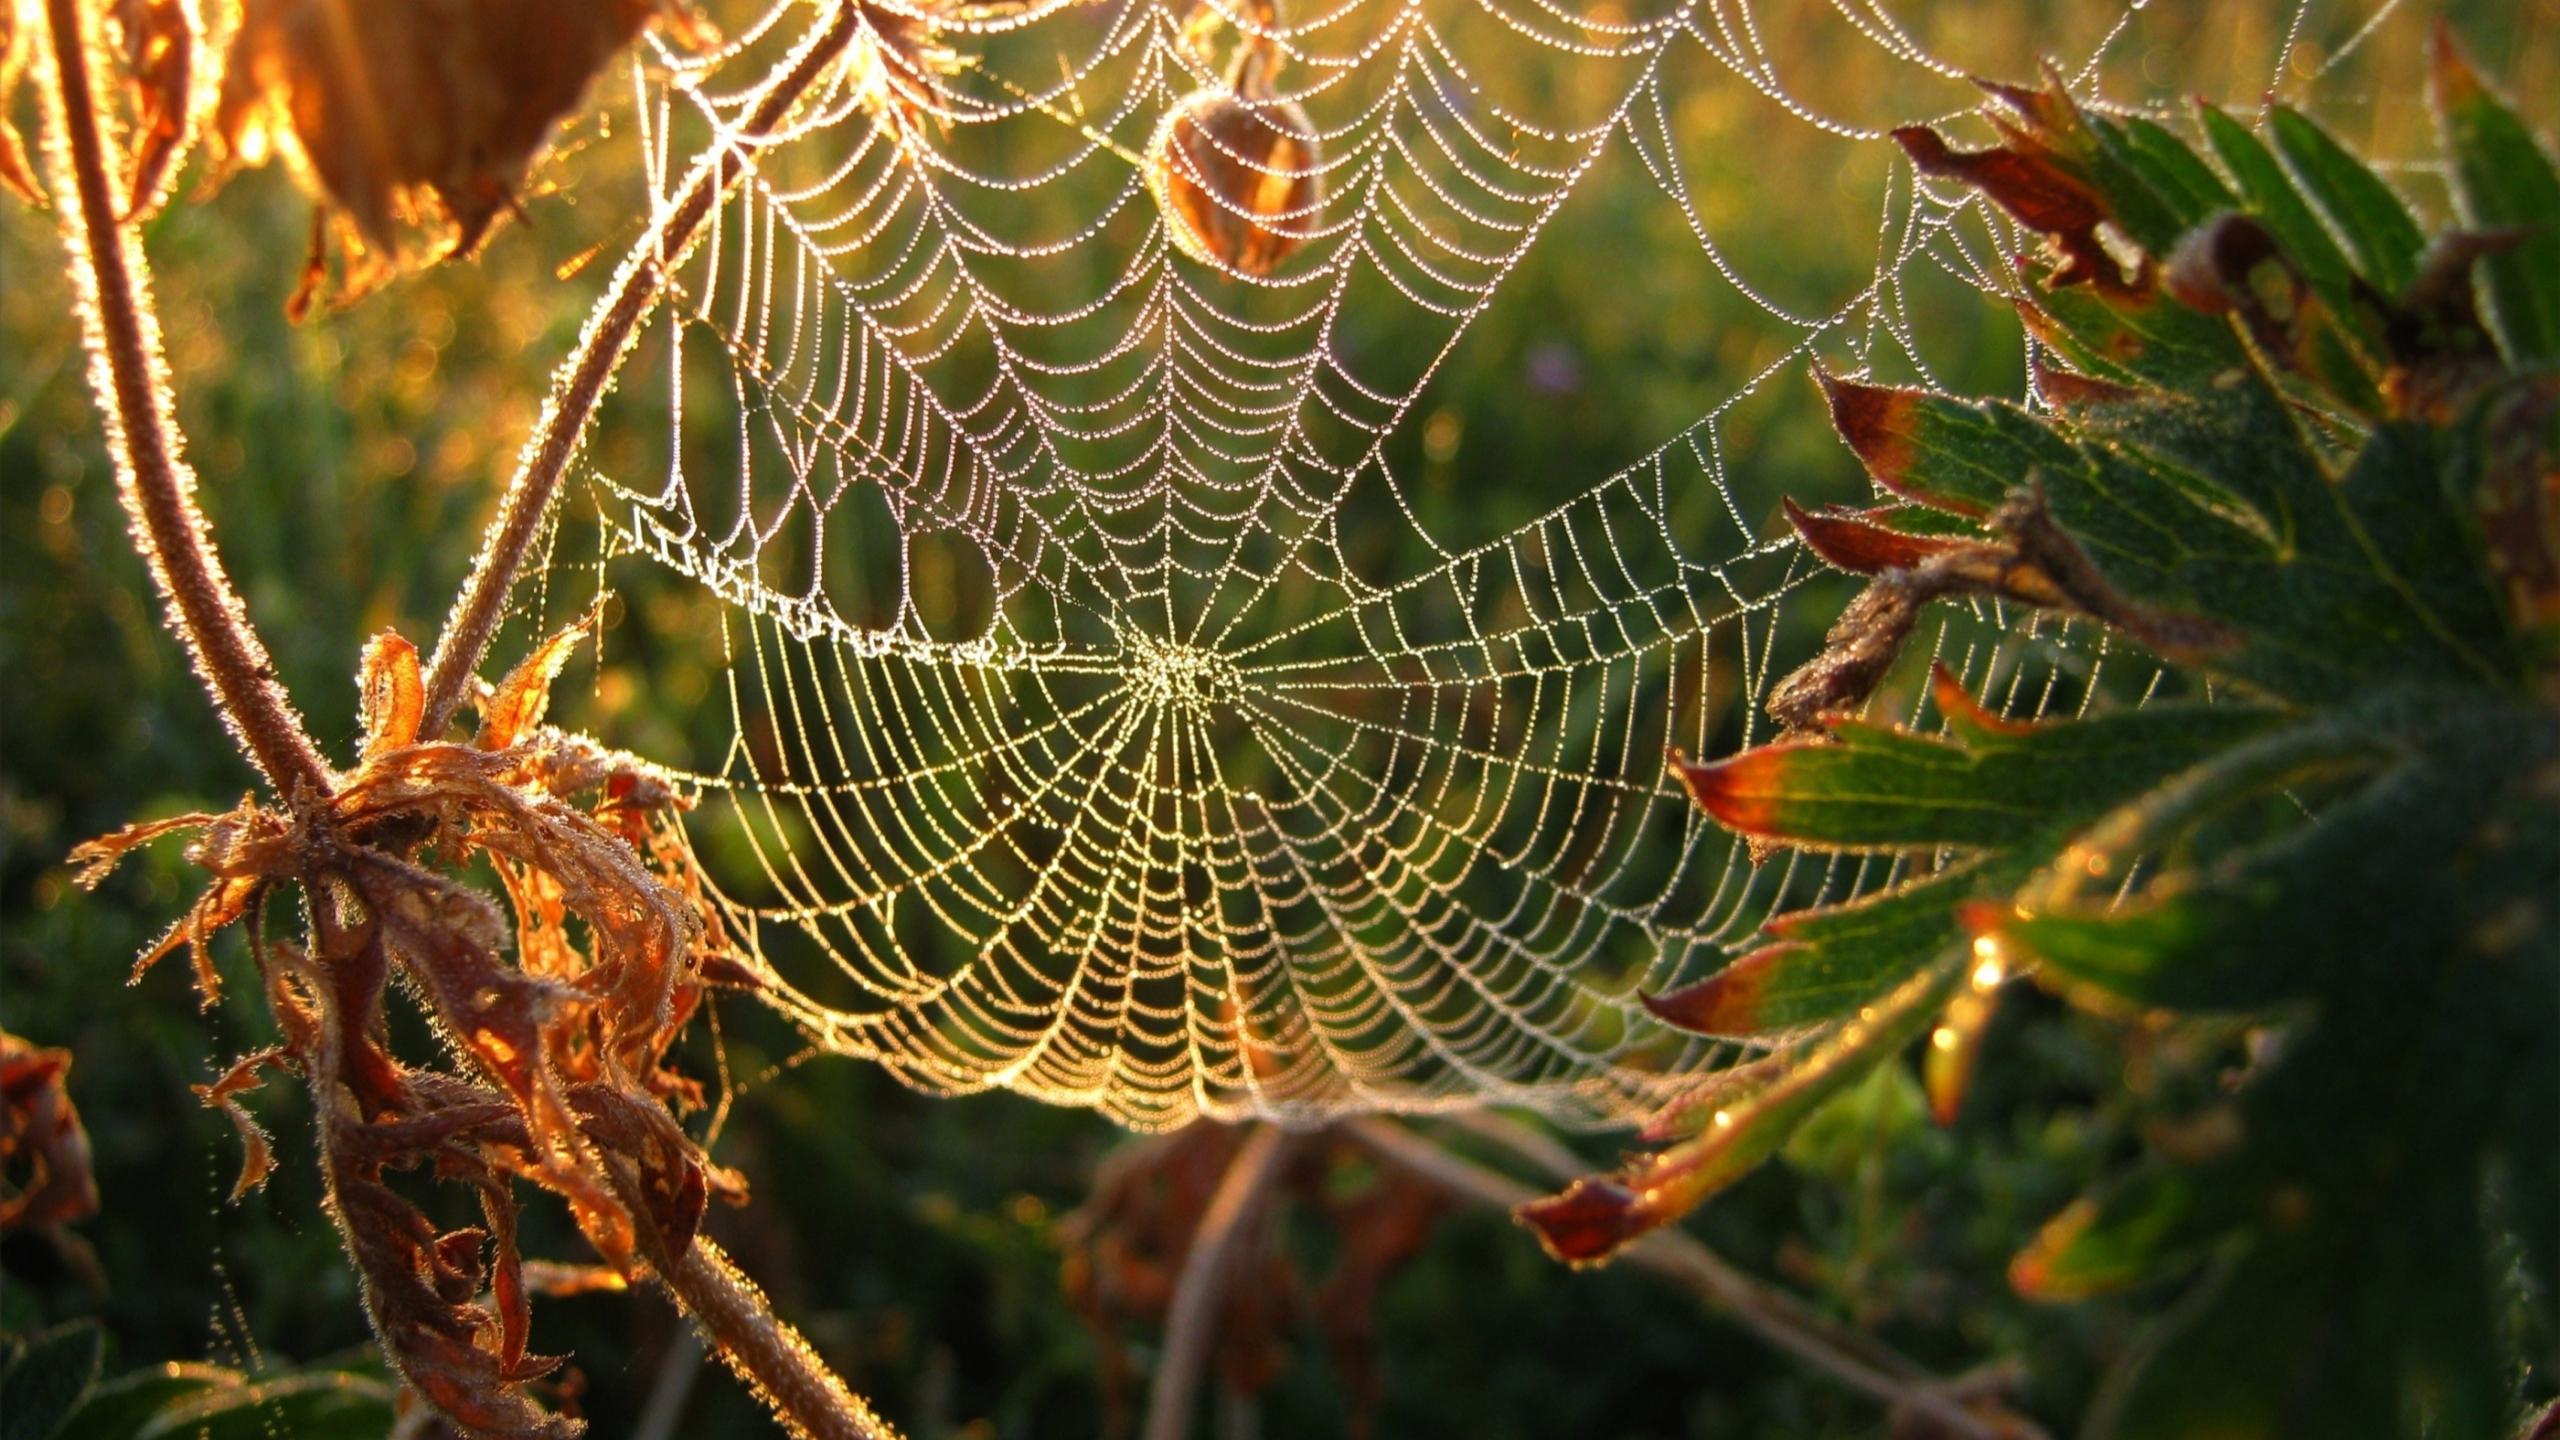 Dew on spider web Mac Wallpaper Download Mac Wallpapers 2560x1440